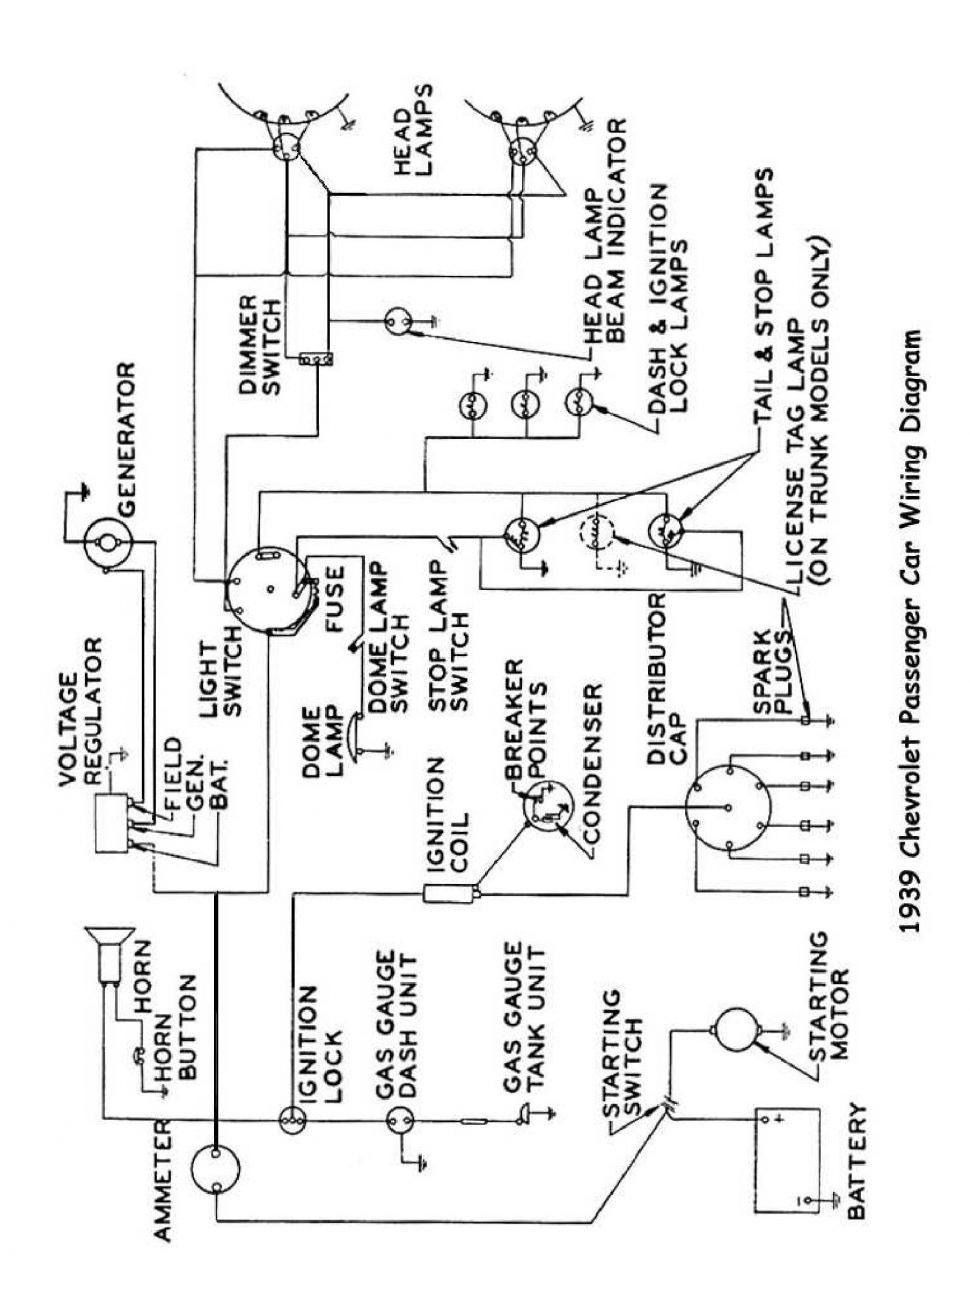 John Deere 318 Starter Wiring Diagram Usb Mini B Wire Great Installation Of Ultra Remote Car Wiringdiagram Org Rh Pinterest Com Onan